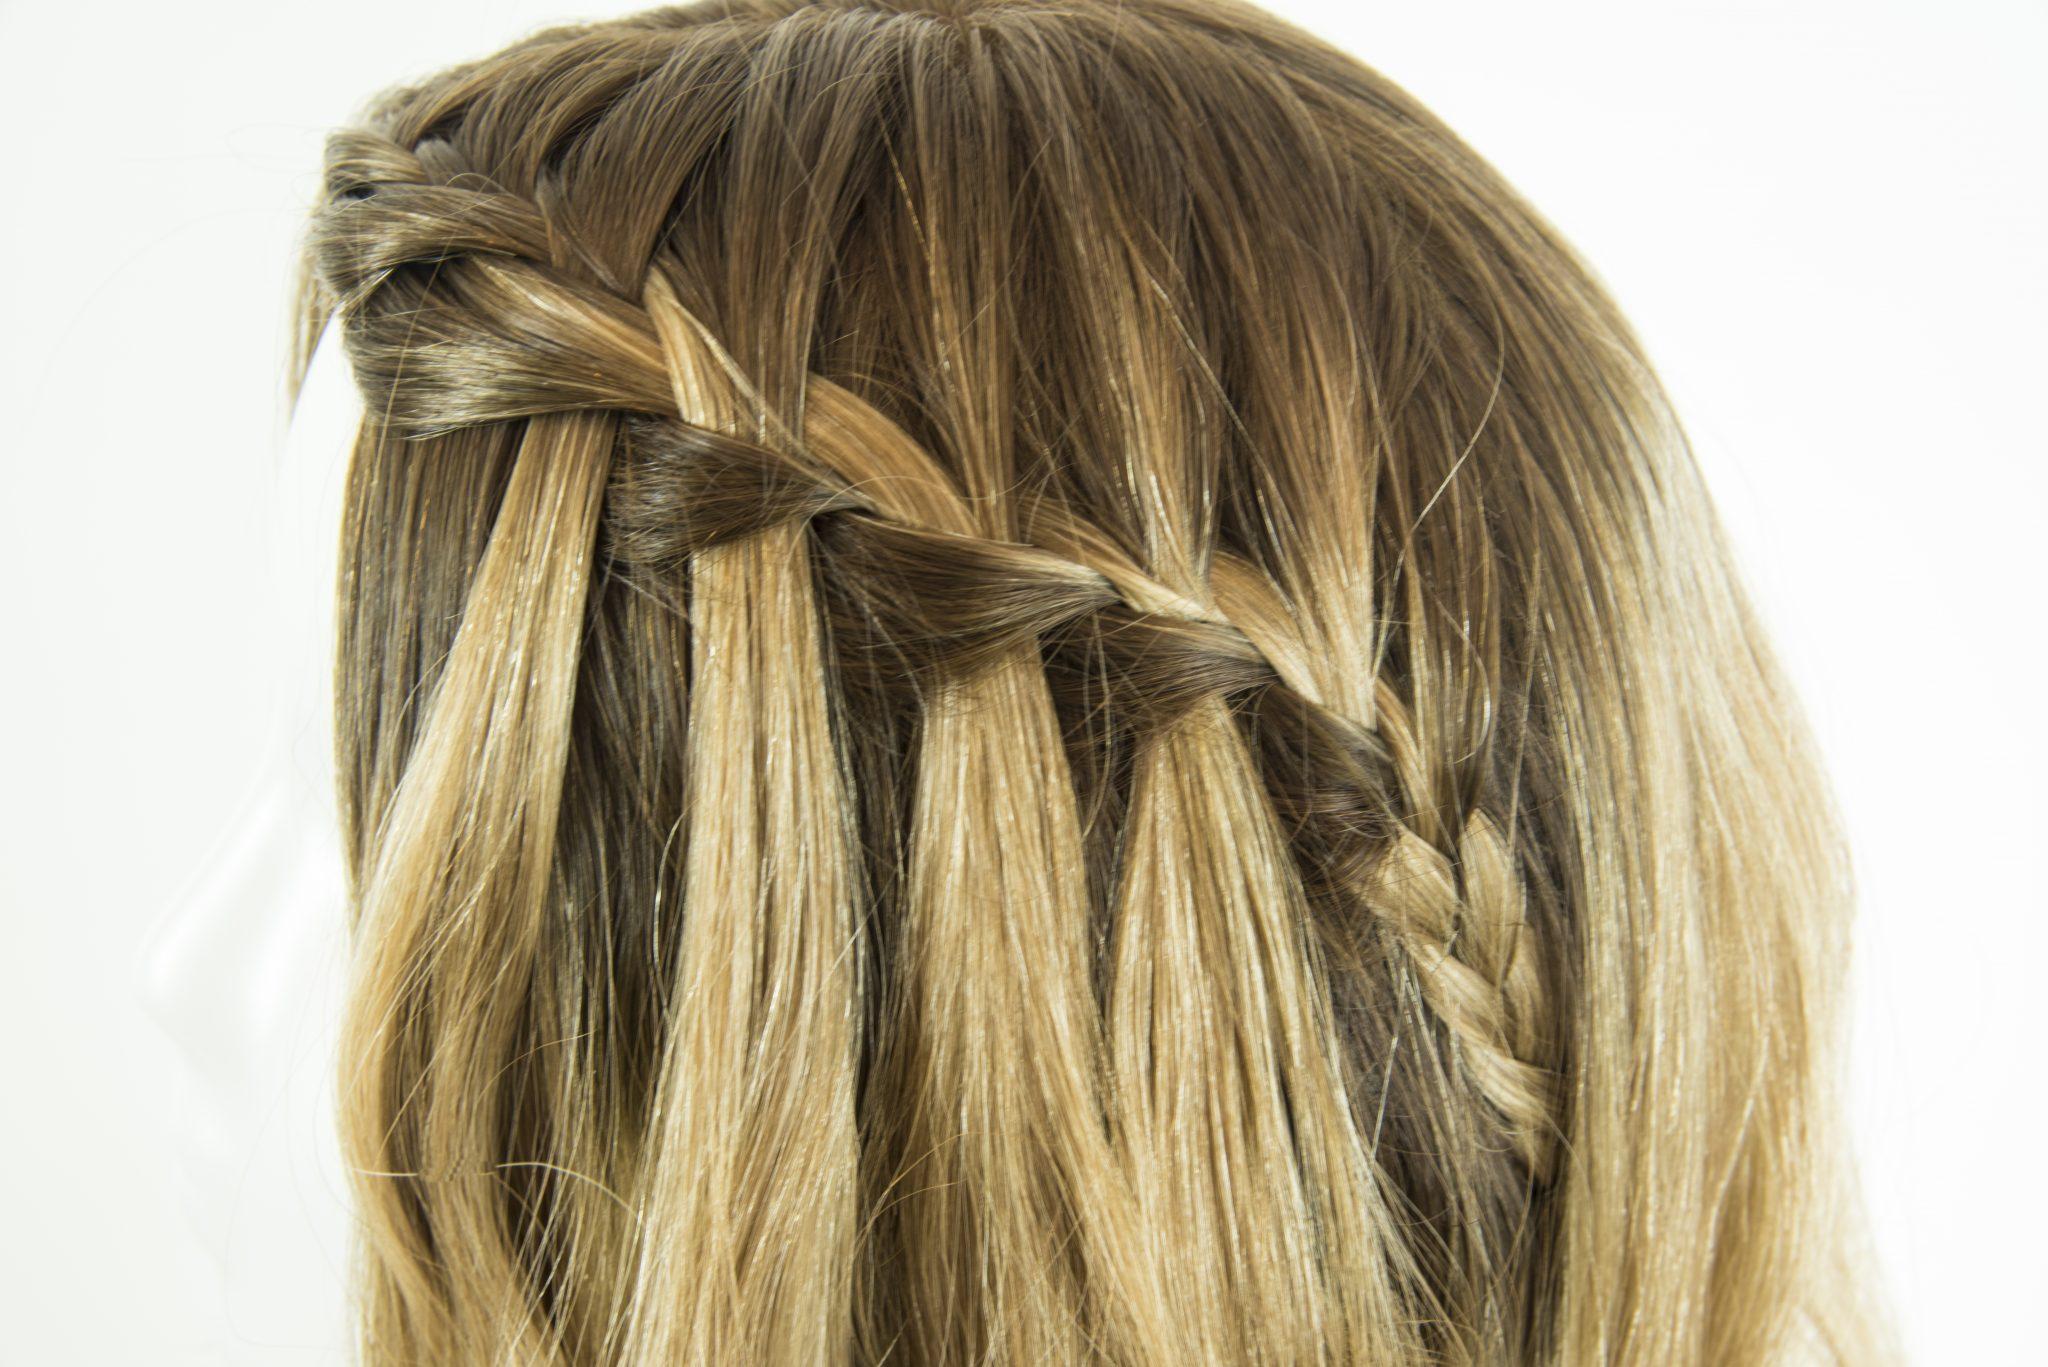 gallery-hair Naama Group academy awards event 2016, Naama group, Naama wigs, Naama hair, 360 degree band, I band, wigless wig, virgin rely hir, processed hair, custom wigs, Frum Wigs, Sheitels, kosher wigs